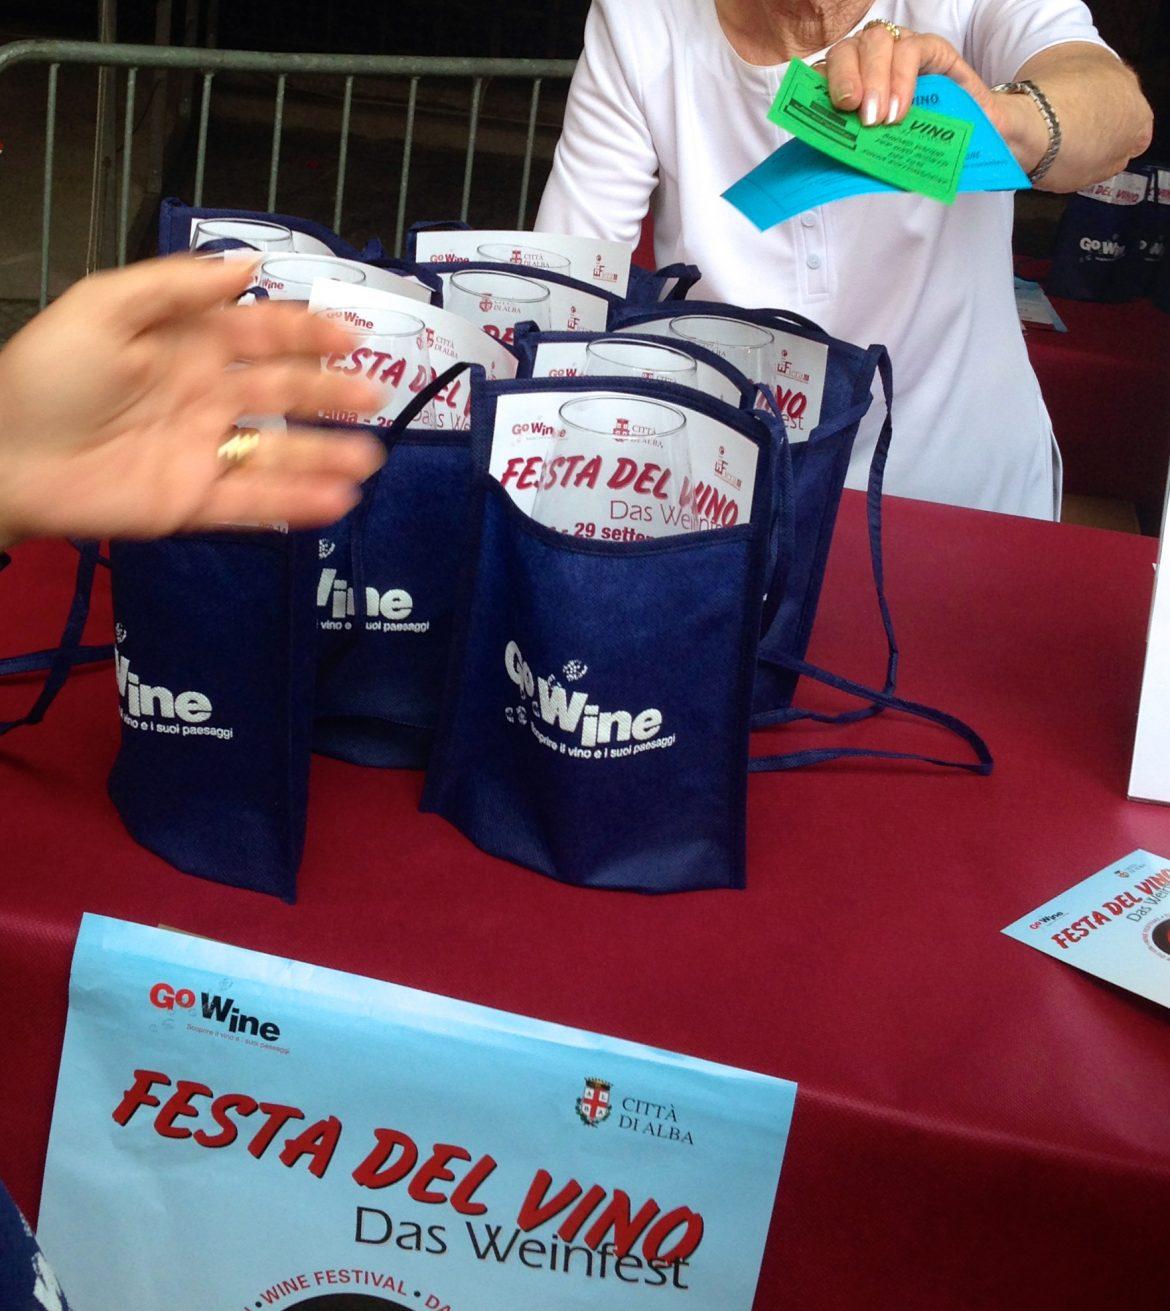 Piedmont Wine Tasting and Education: Alba Festa del Vino